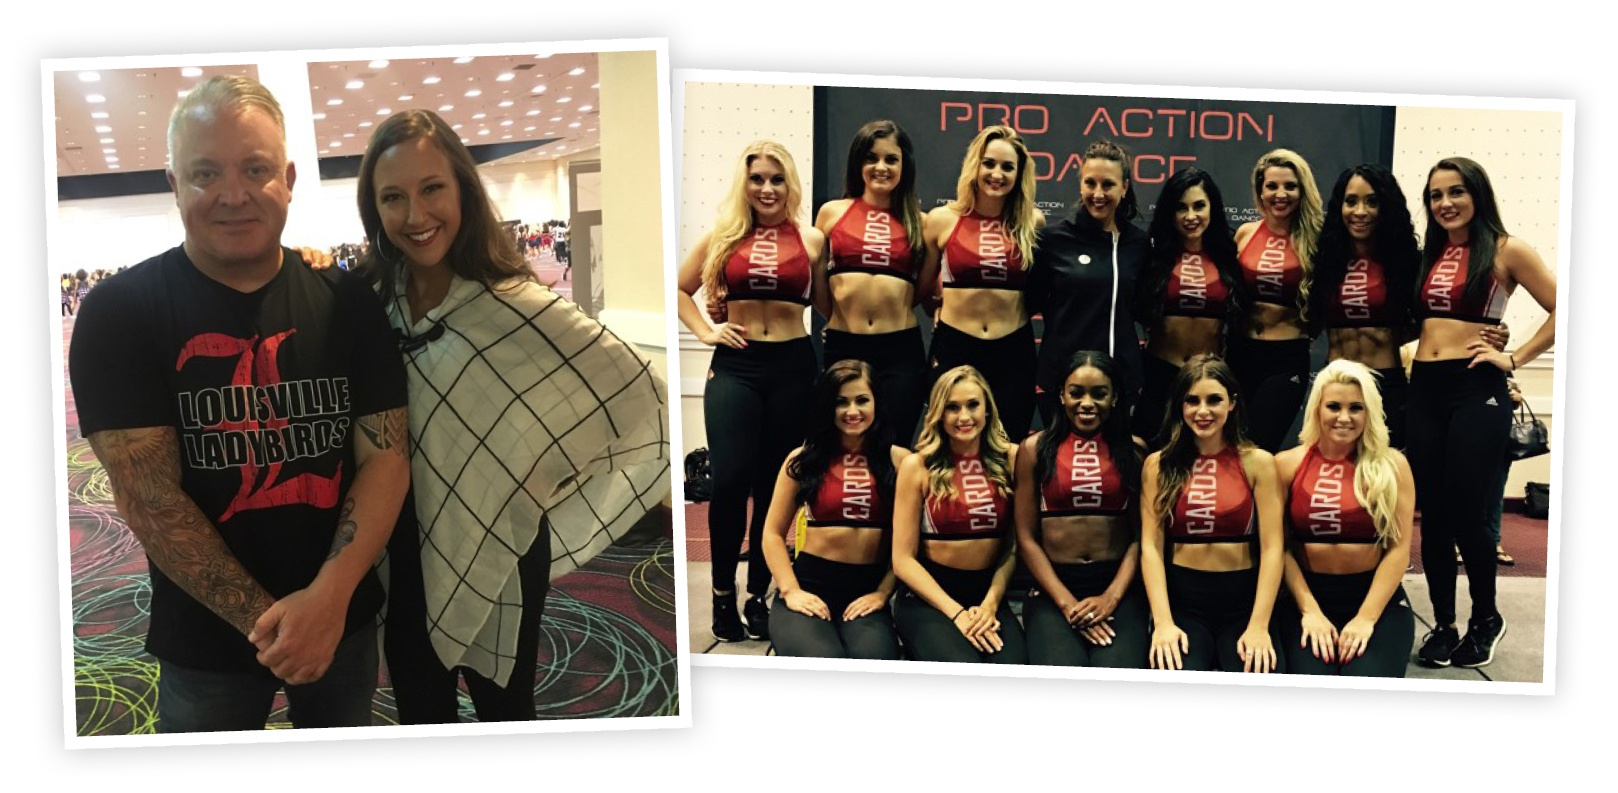 Louisville Ladybirds Dance Costumes at Pro Action Todd Sharp.jpg